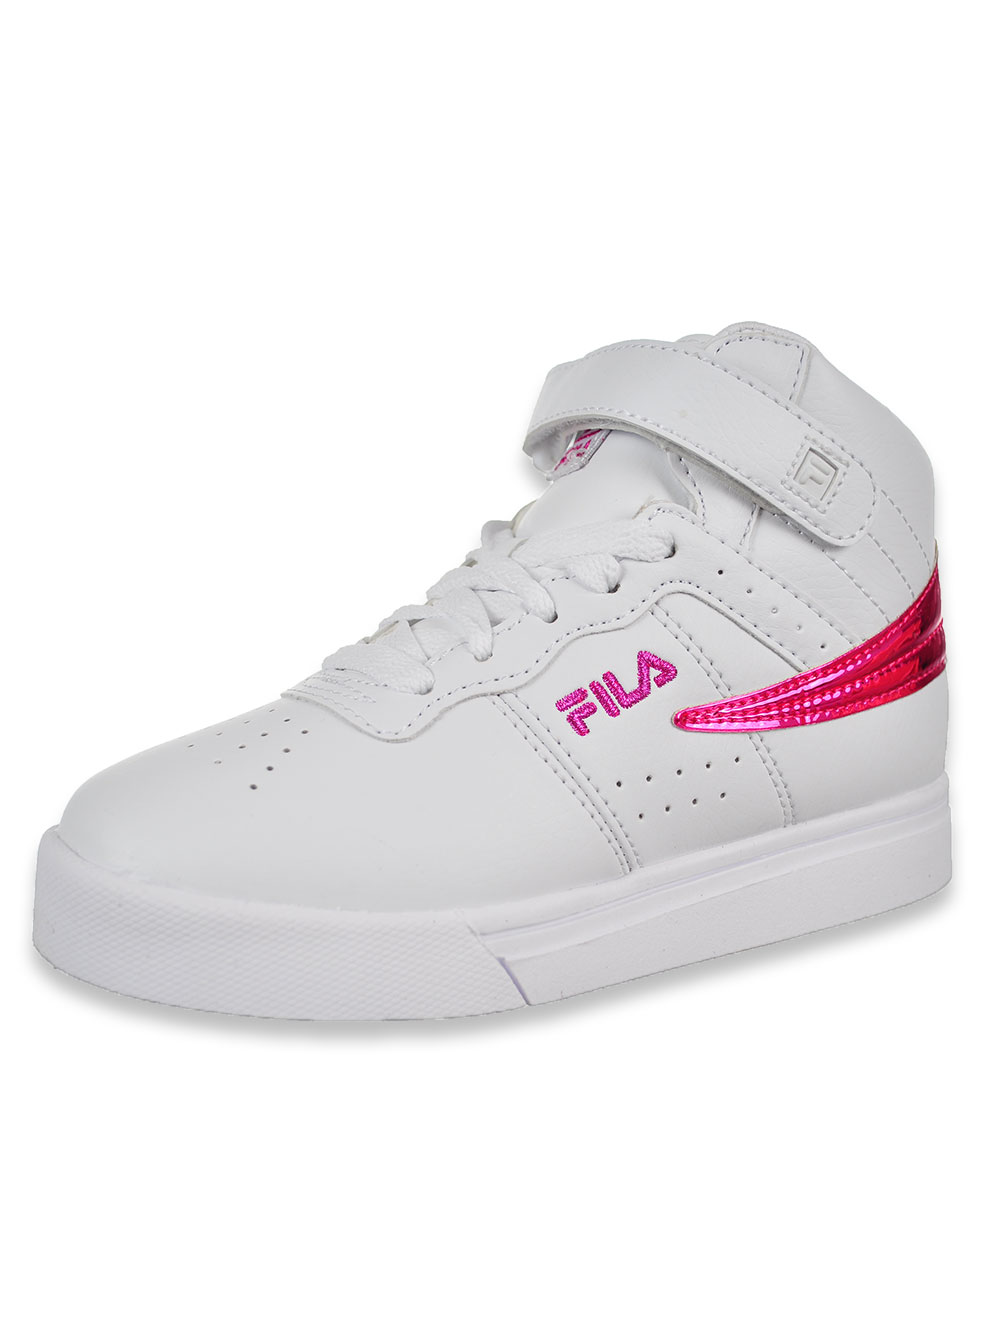 Girls' Vulc 13 Chrome Hi Top Sneakers by Fila in White